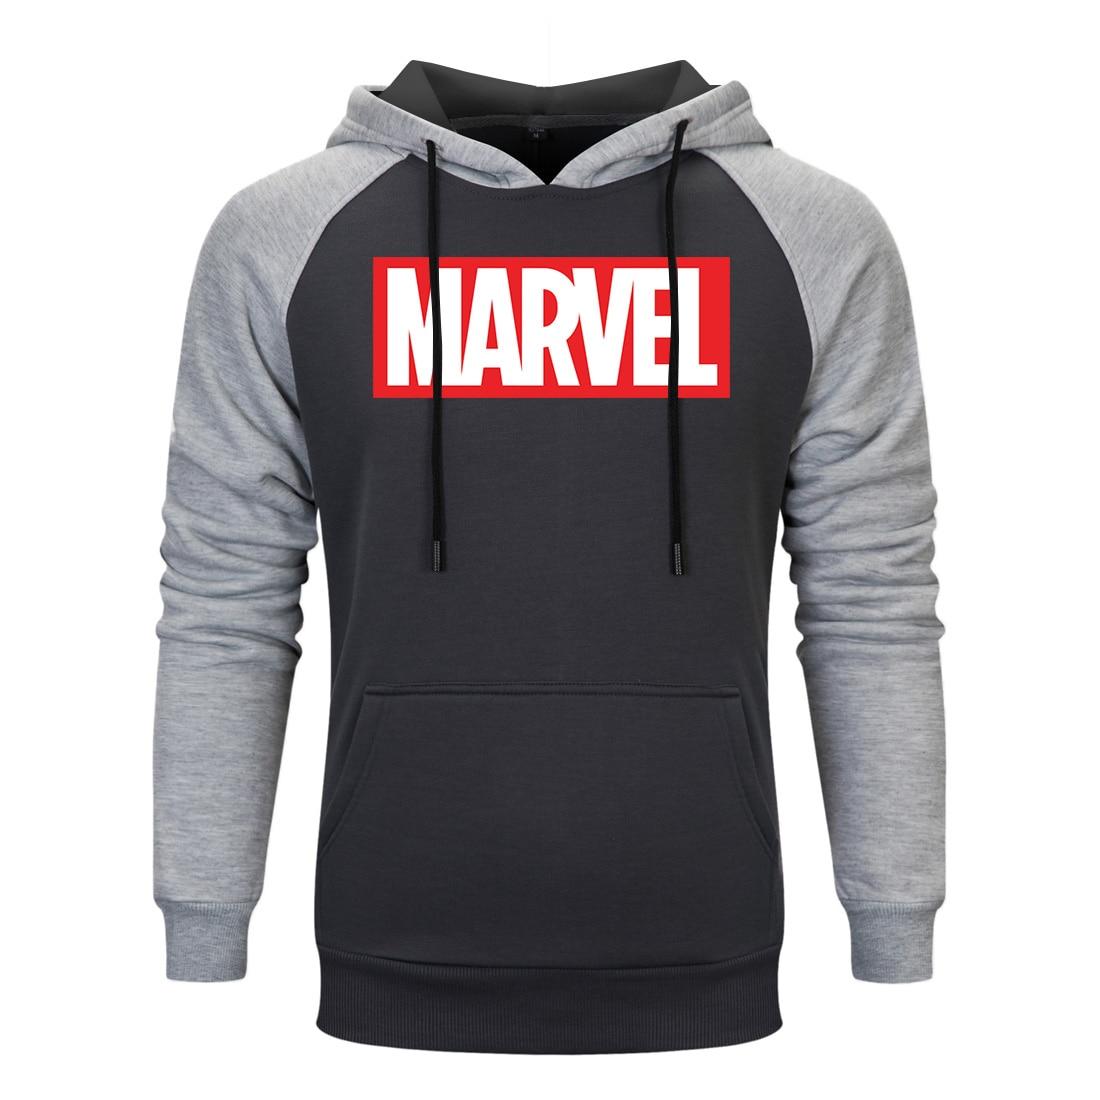 2019 Fashion Marvel Sweatshirt Men Autumn New Avengers Cotton Cool Street Hip Hop Clothing Casual Hoodies Tops Sudadera Hombre